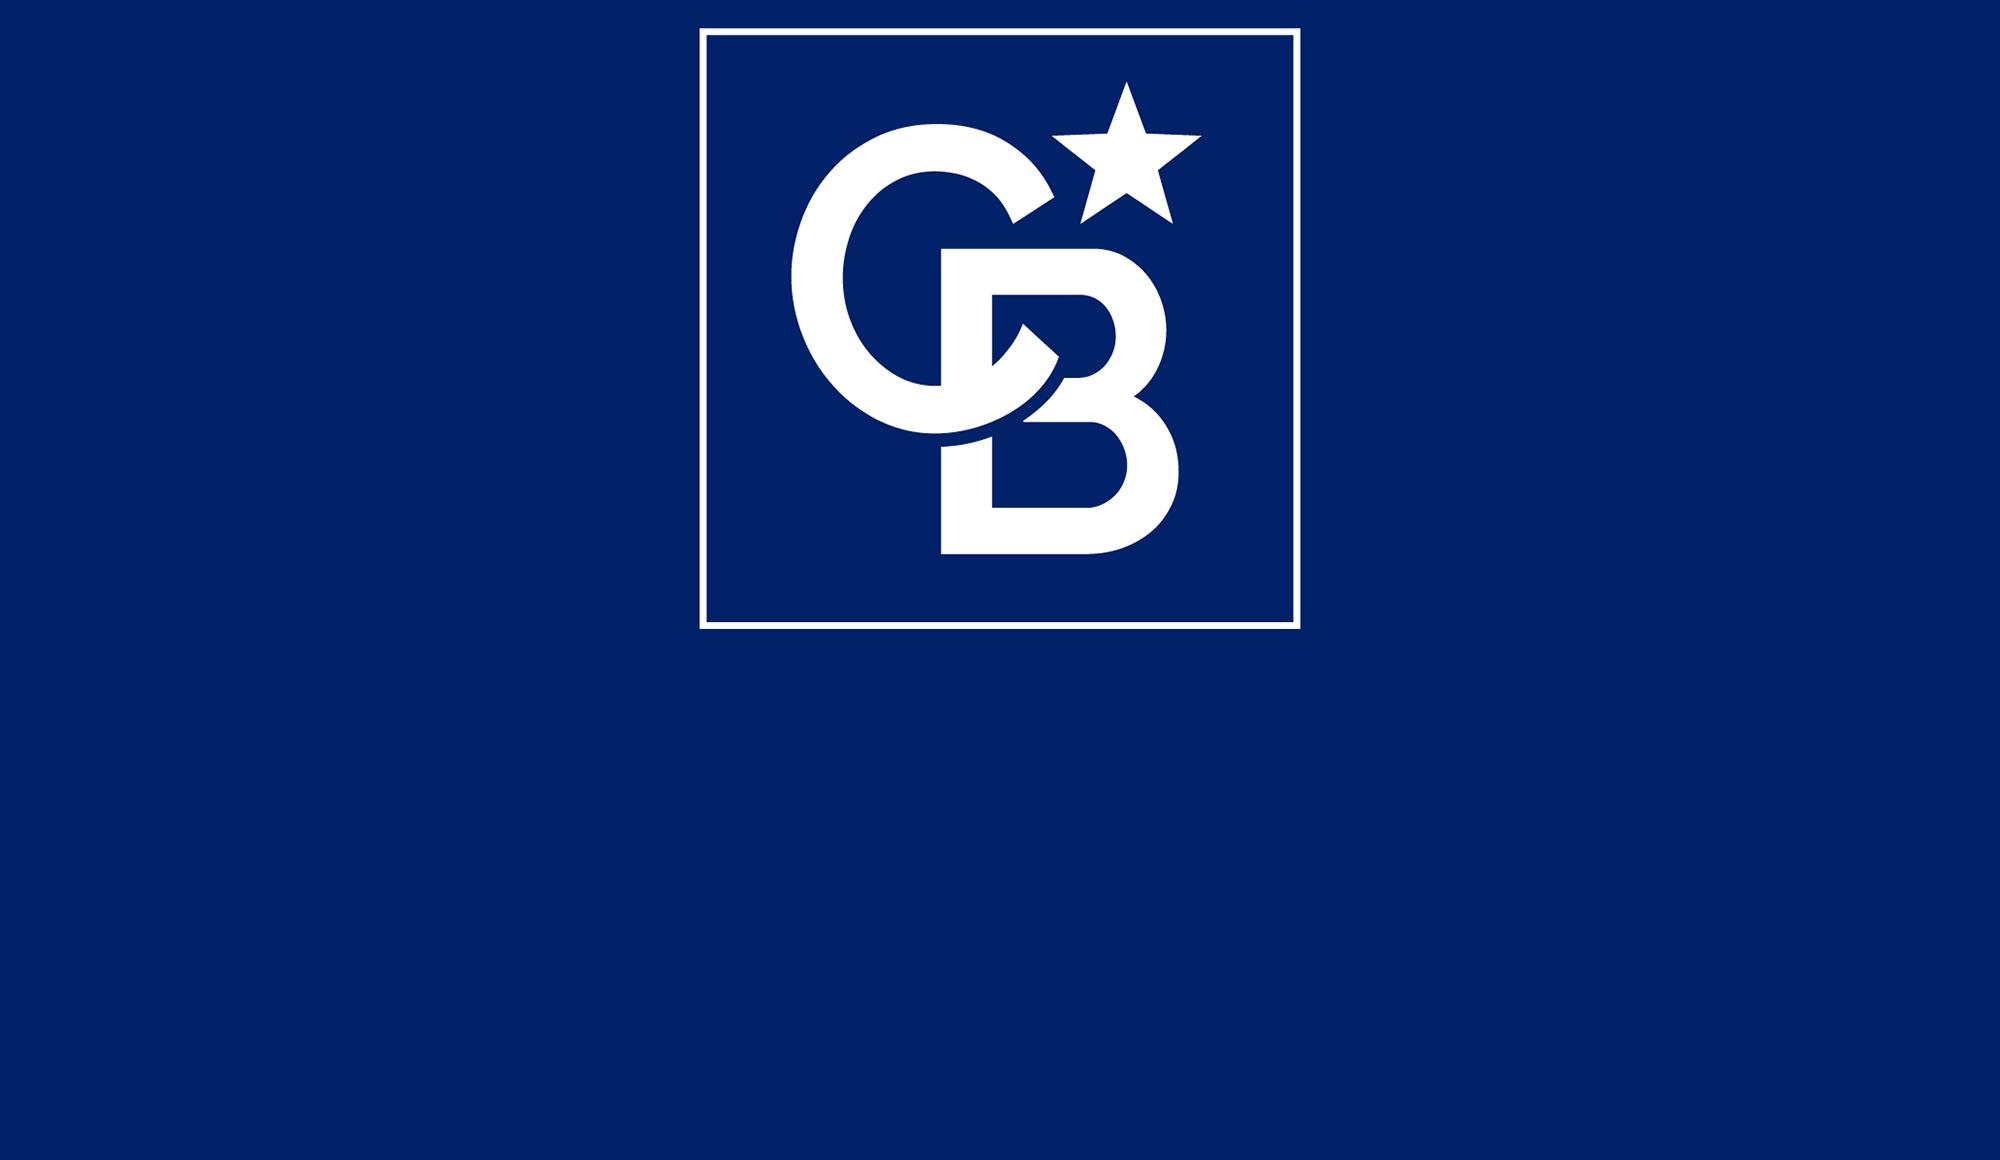 Fran Good - Coldwell Banker Apex Logo